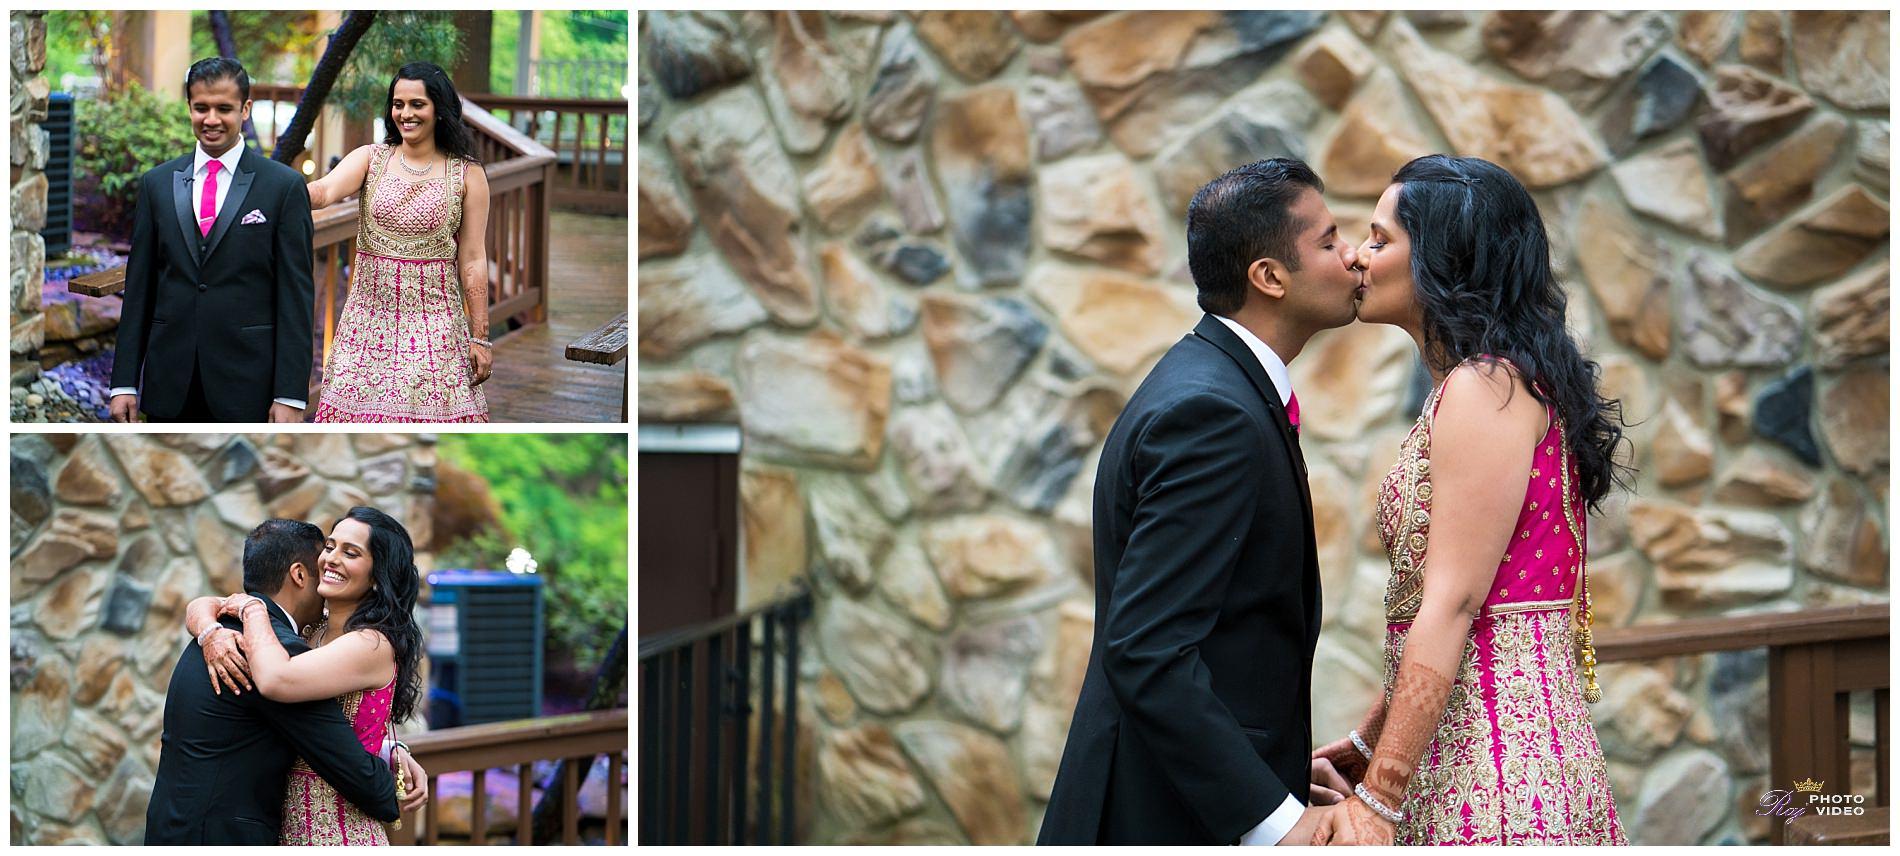 Martinsville-Gardens-NJ-Indian-Wedding-Ruchi-Vishal-46.jpg